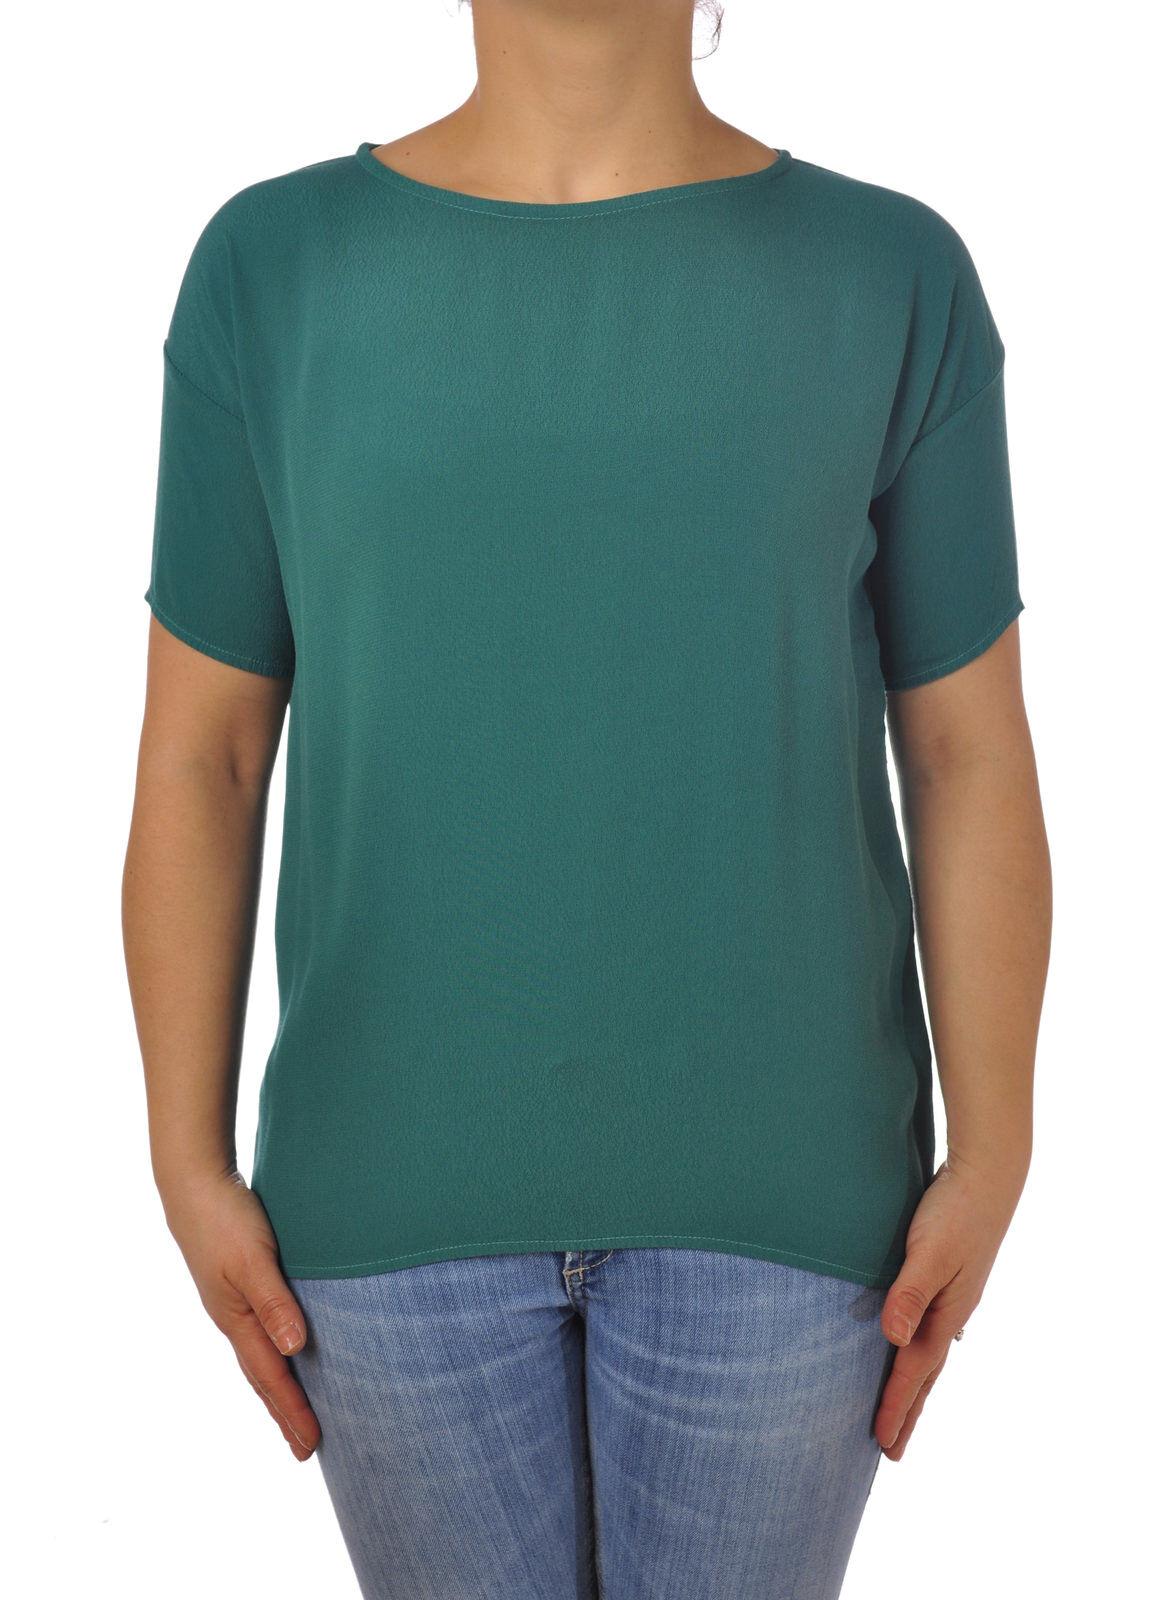 CROSSLEY - Shirts-Blouses - Woman - Grün - 5086324D183650